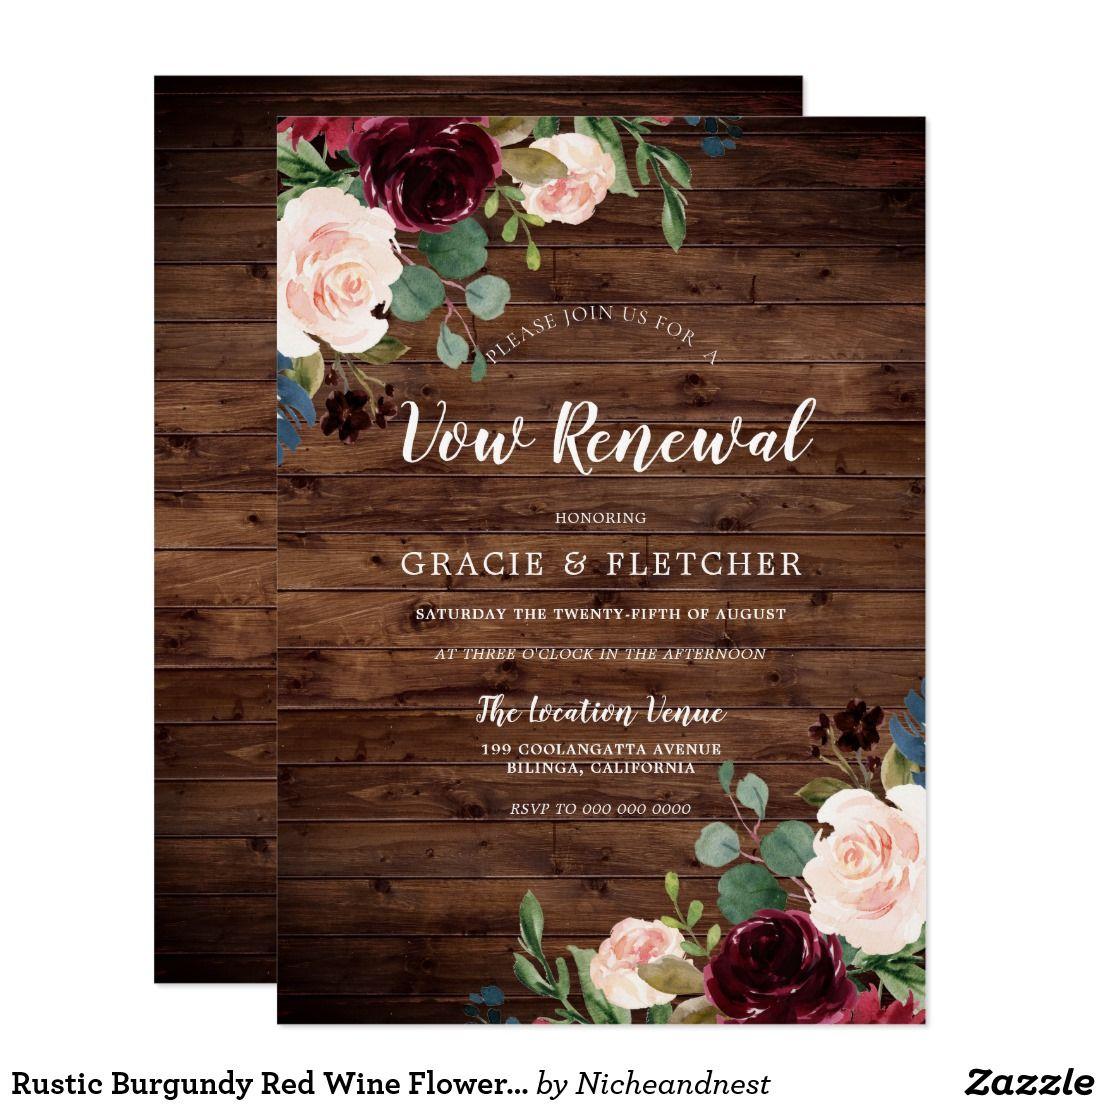 Rustic Burgundy Red Wine Flowers Vow Renewal Invitation